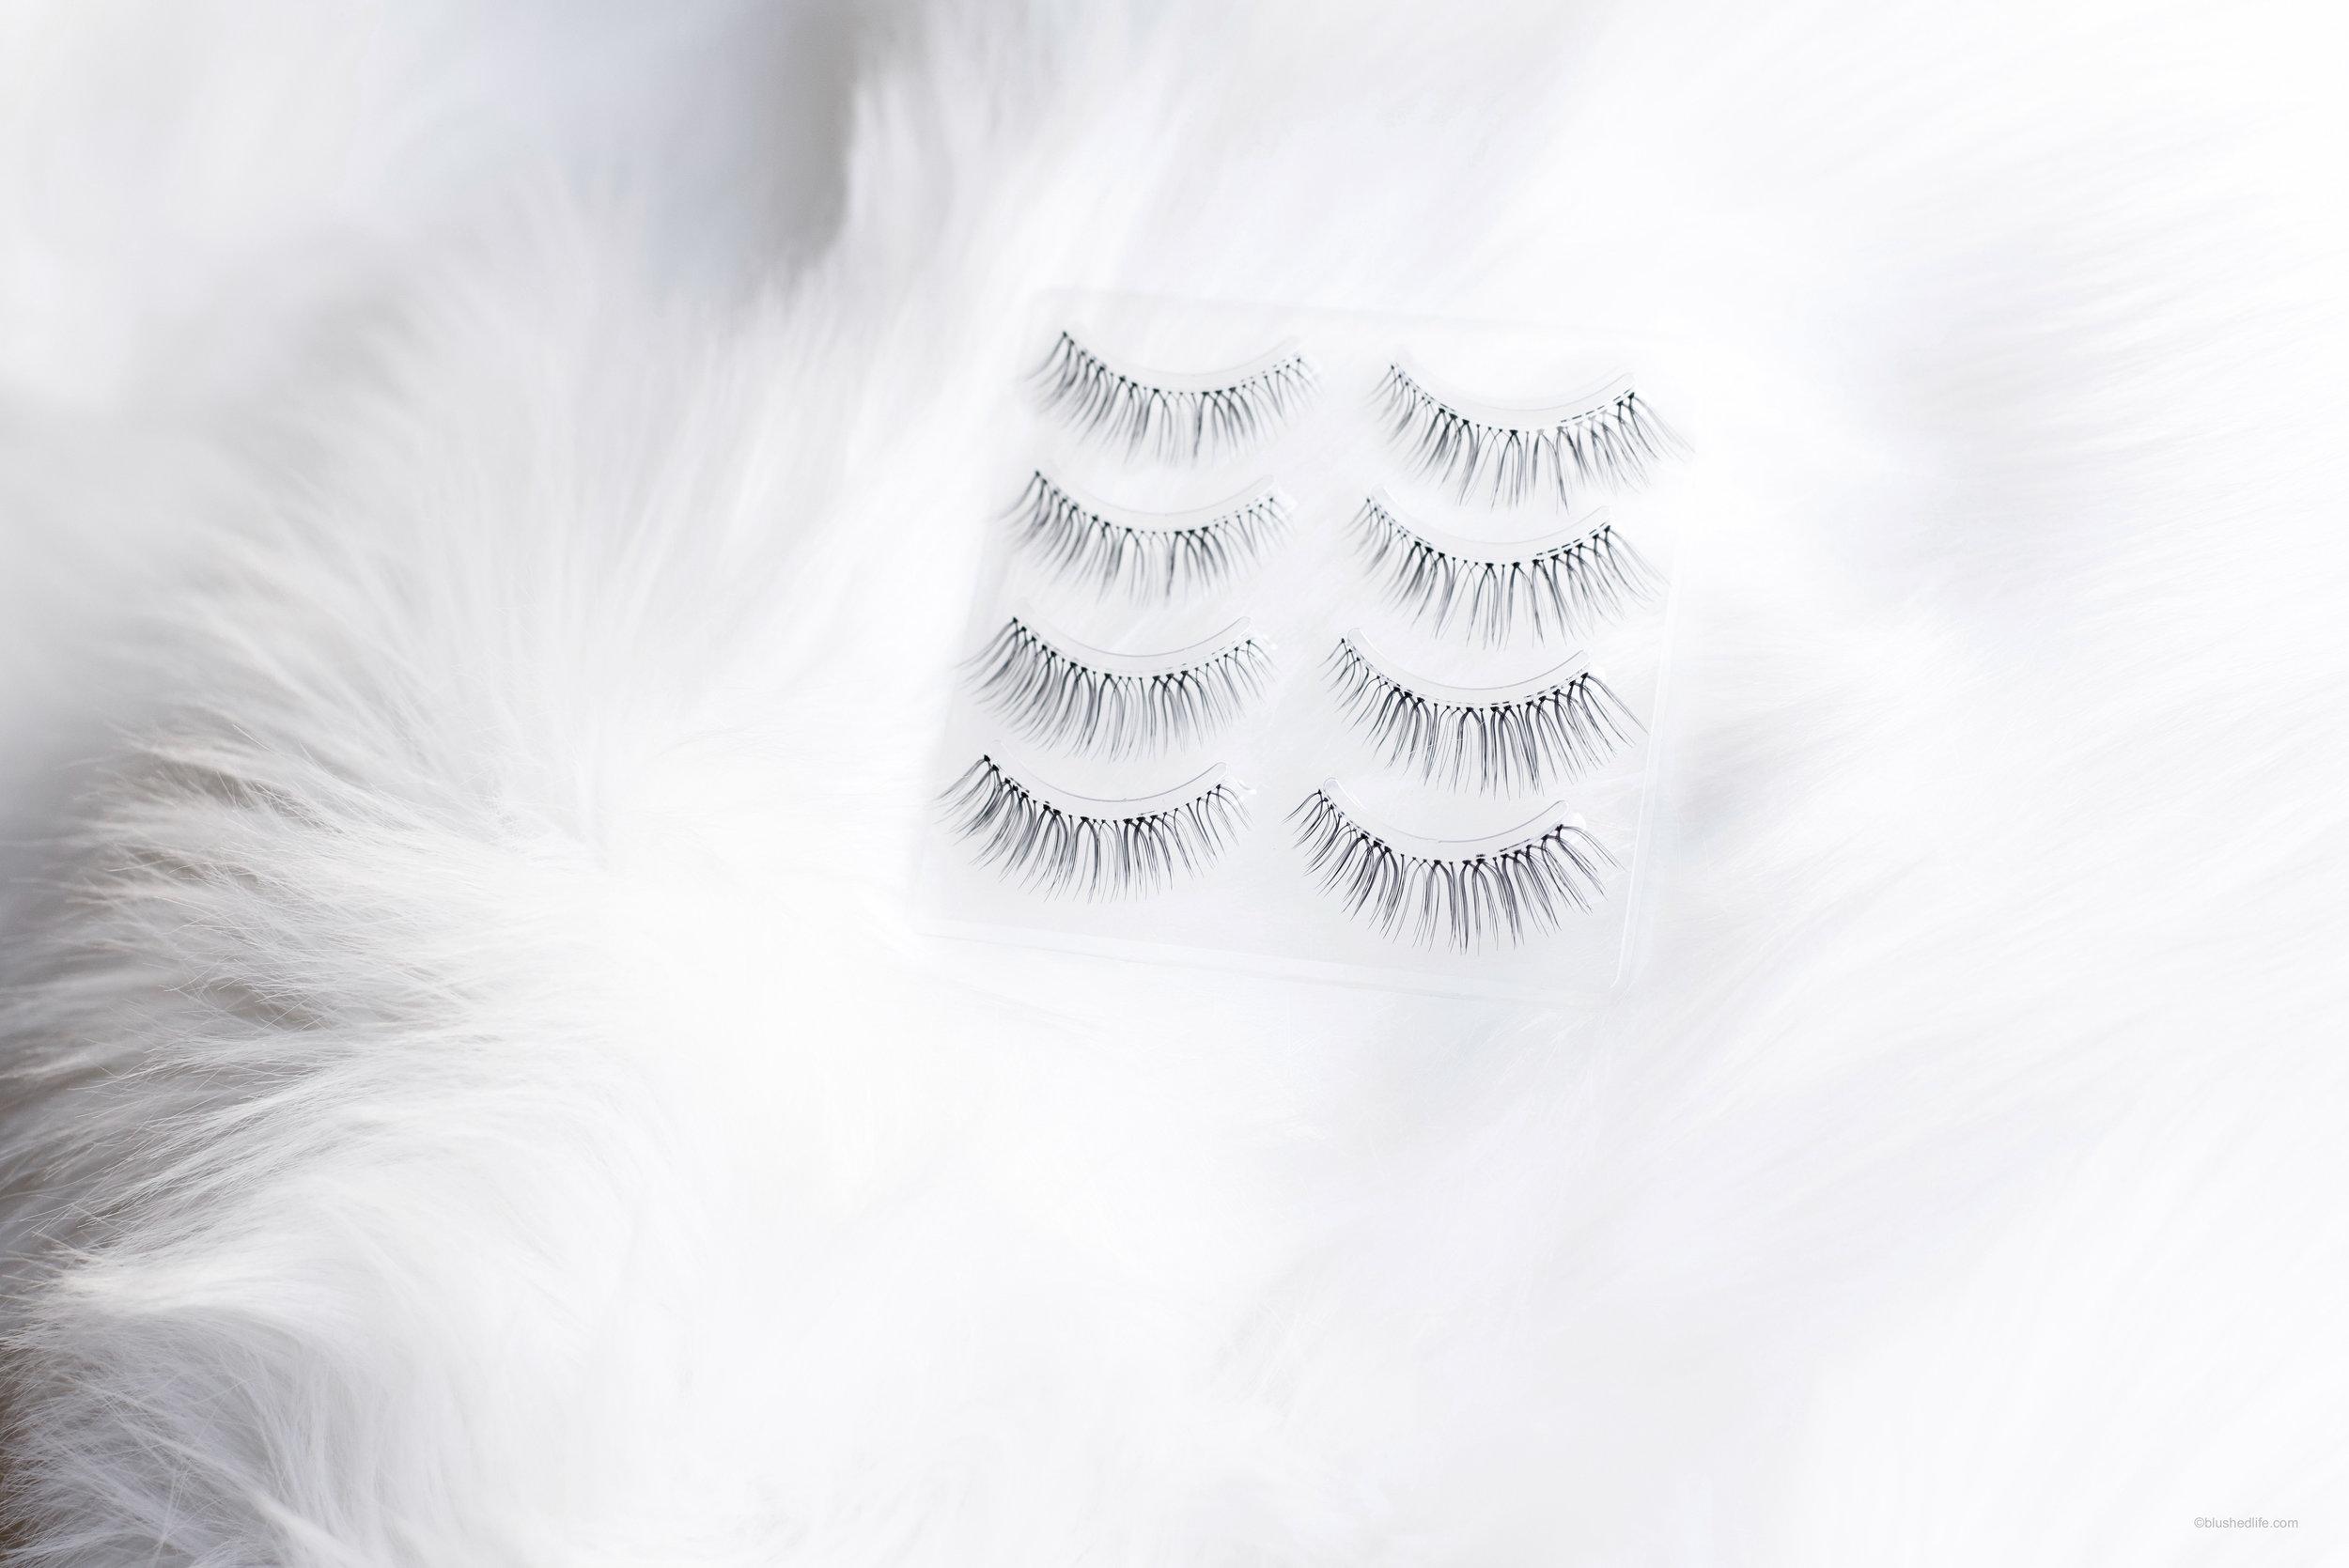 false lashes for asian eyes miche bloomin_DSC_3681-2.jpg